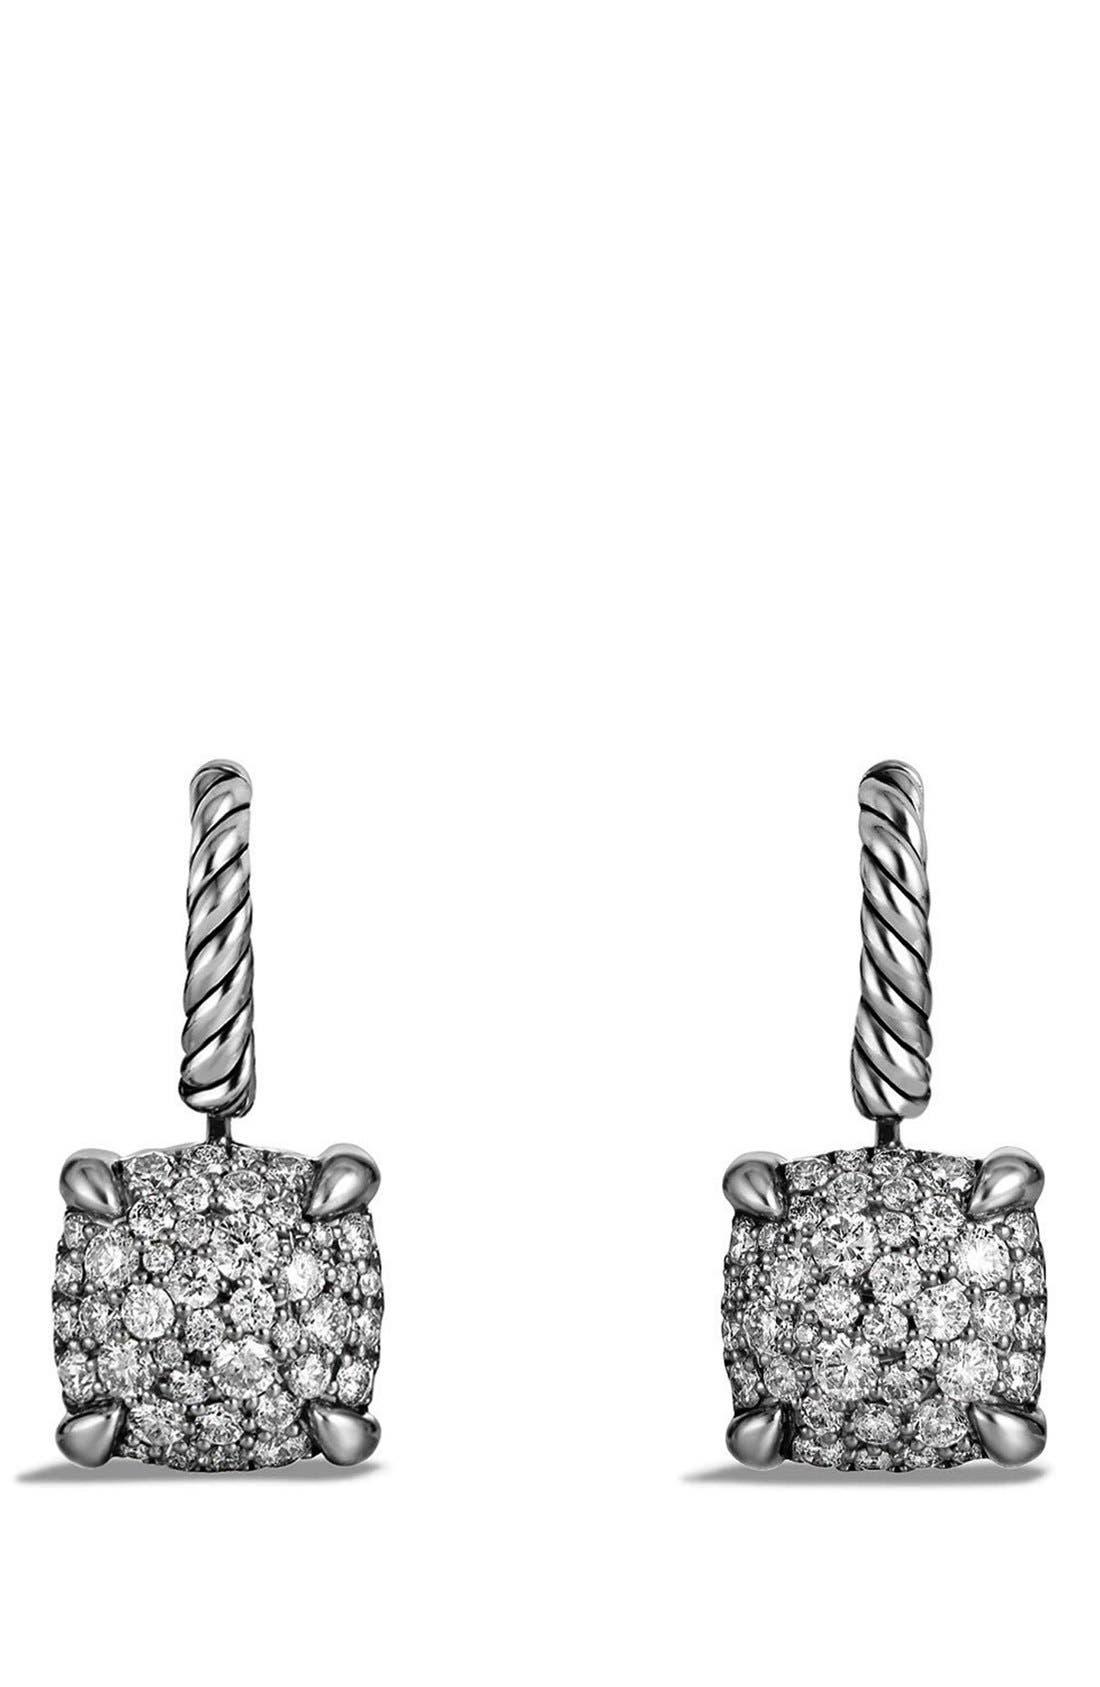 David Yurman 'Châtelaine' Drop Earrings with Diamonds